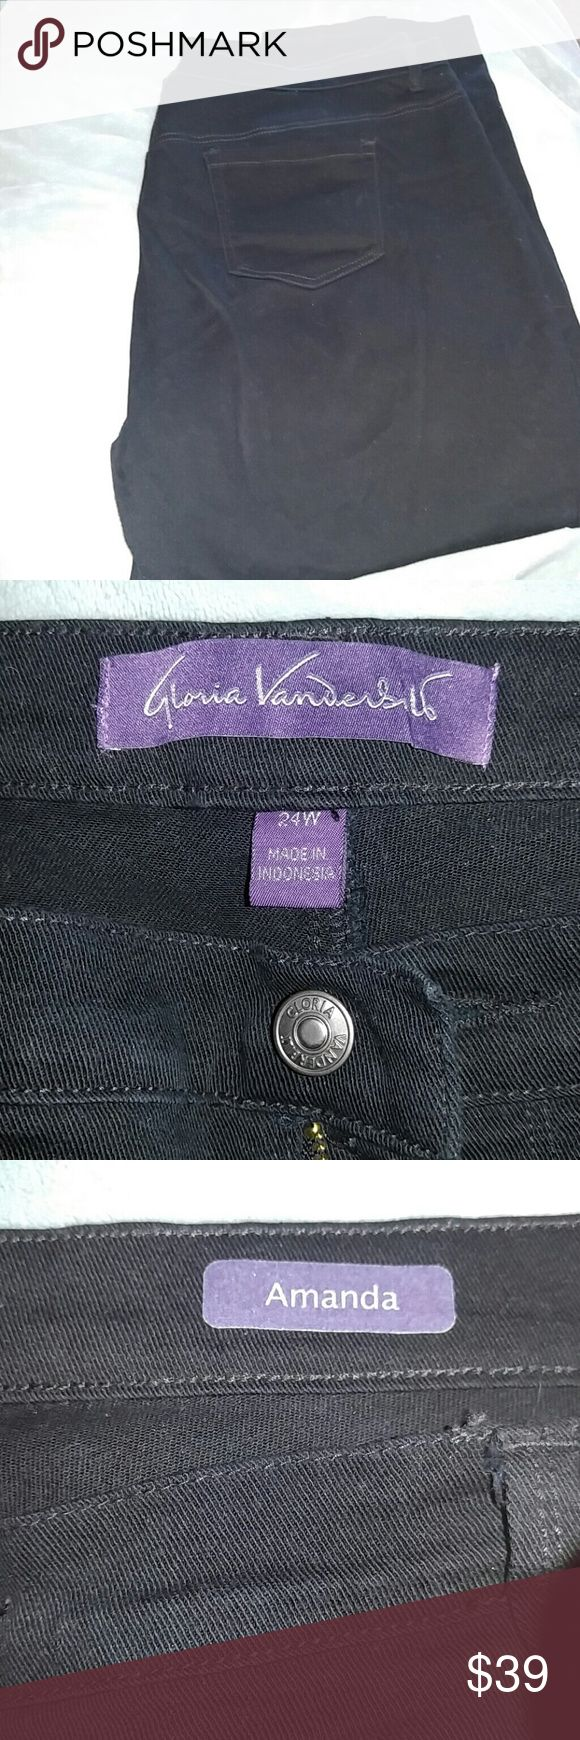 GLORIA VANDERBILT BLACK JEANS Size 24W  has some spandex in them easy to wear and so comfortable. Looks fantastic on. Very slimming. Gloria Vanderbilt Jeans Boyfriend